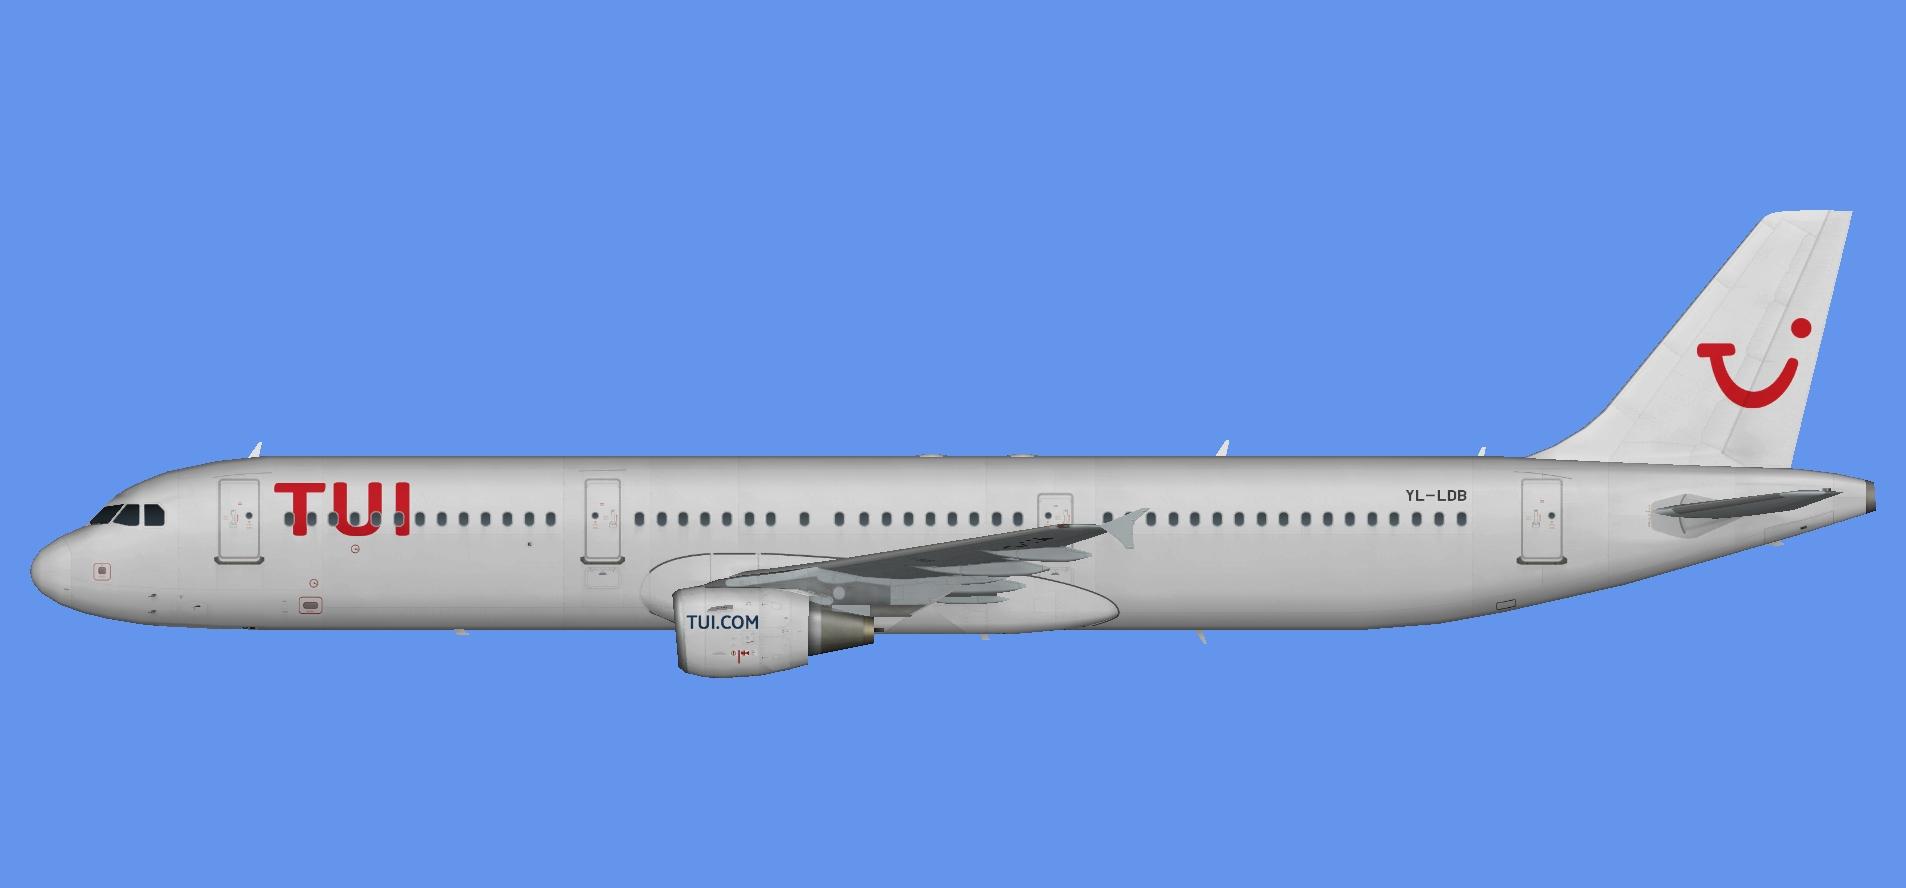 High quality repaints, flightplans, callsigns and aircraft